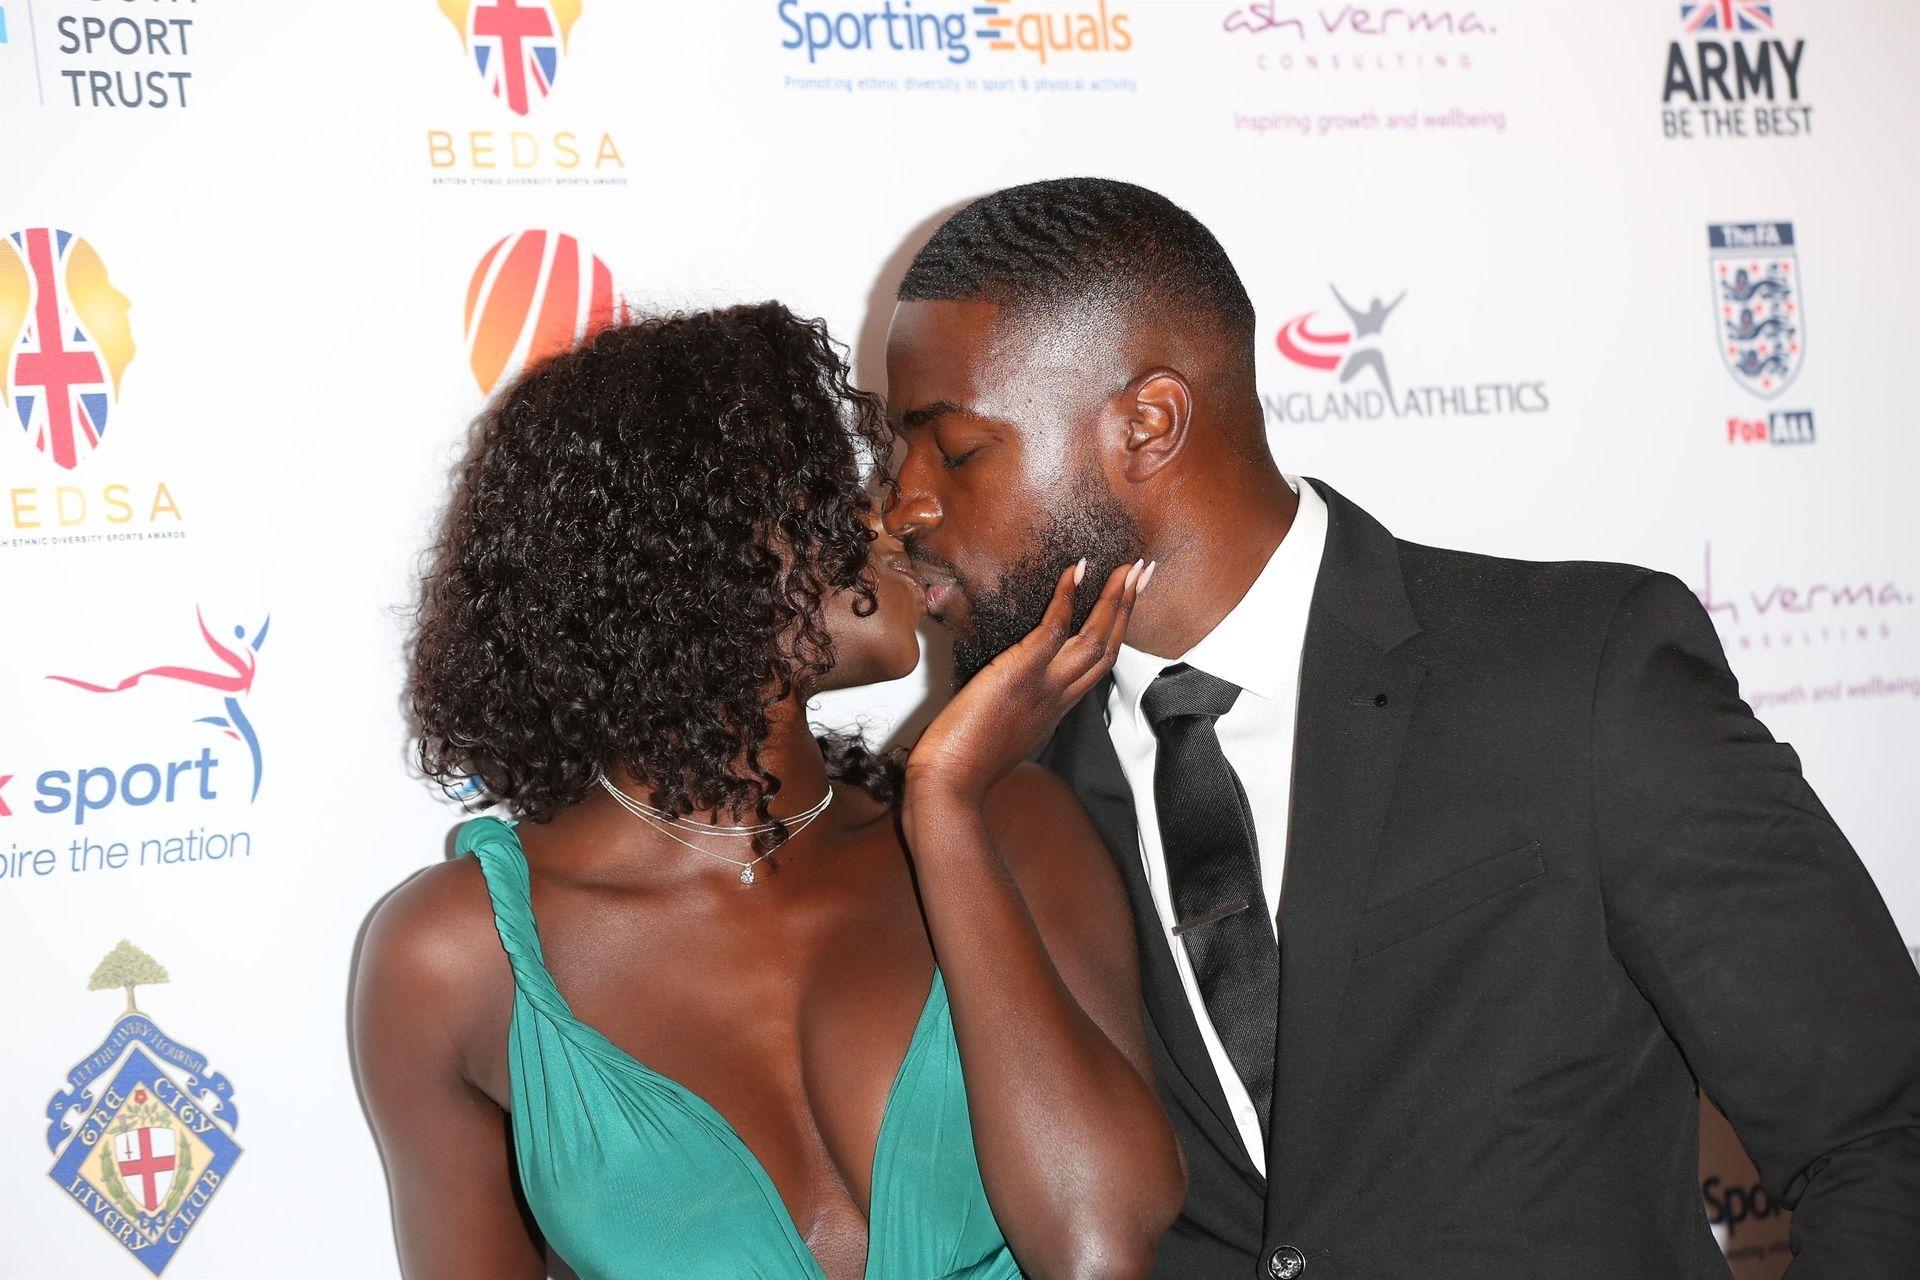 Mike Boateng & Priscilla Anyabu Are Seen At British Ethnic Diversity Sports Awards 0050